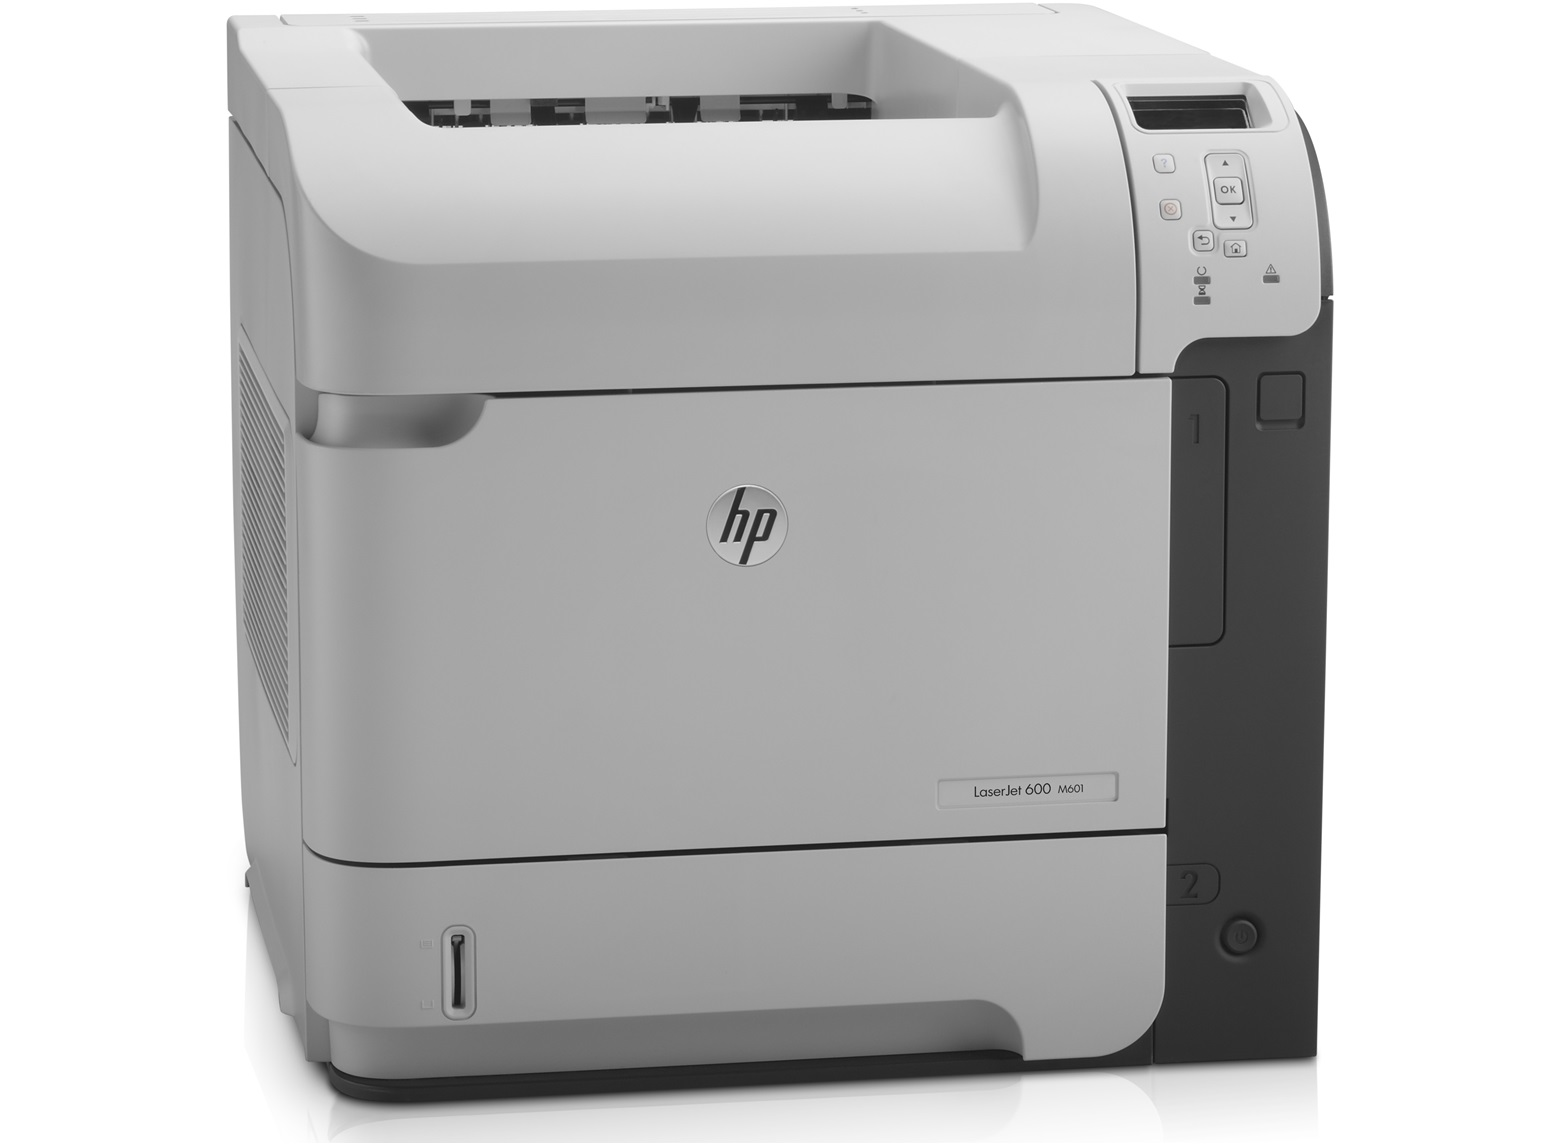 Laserjet 600 M601